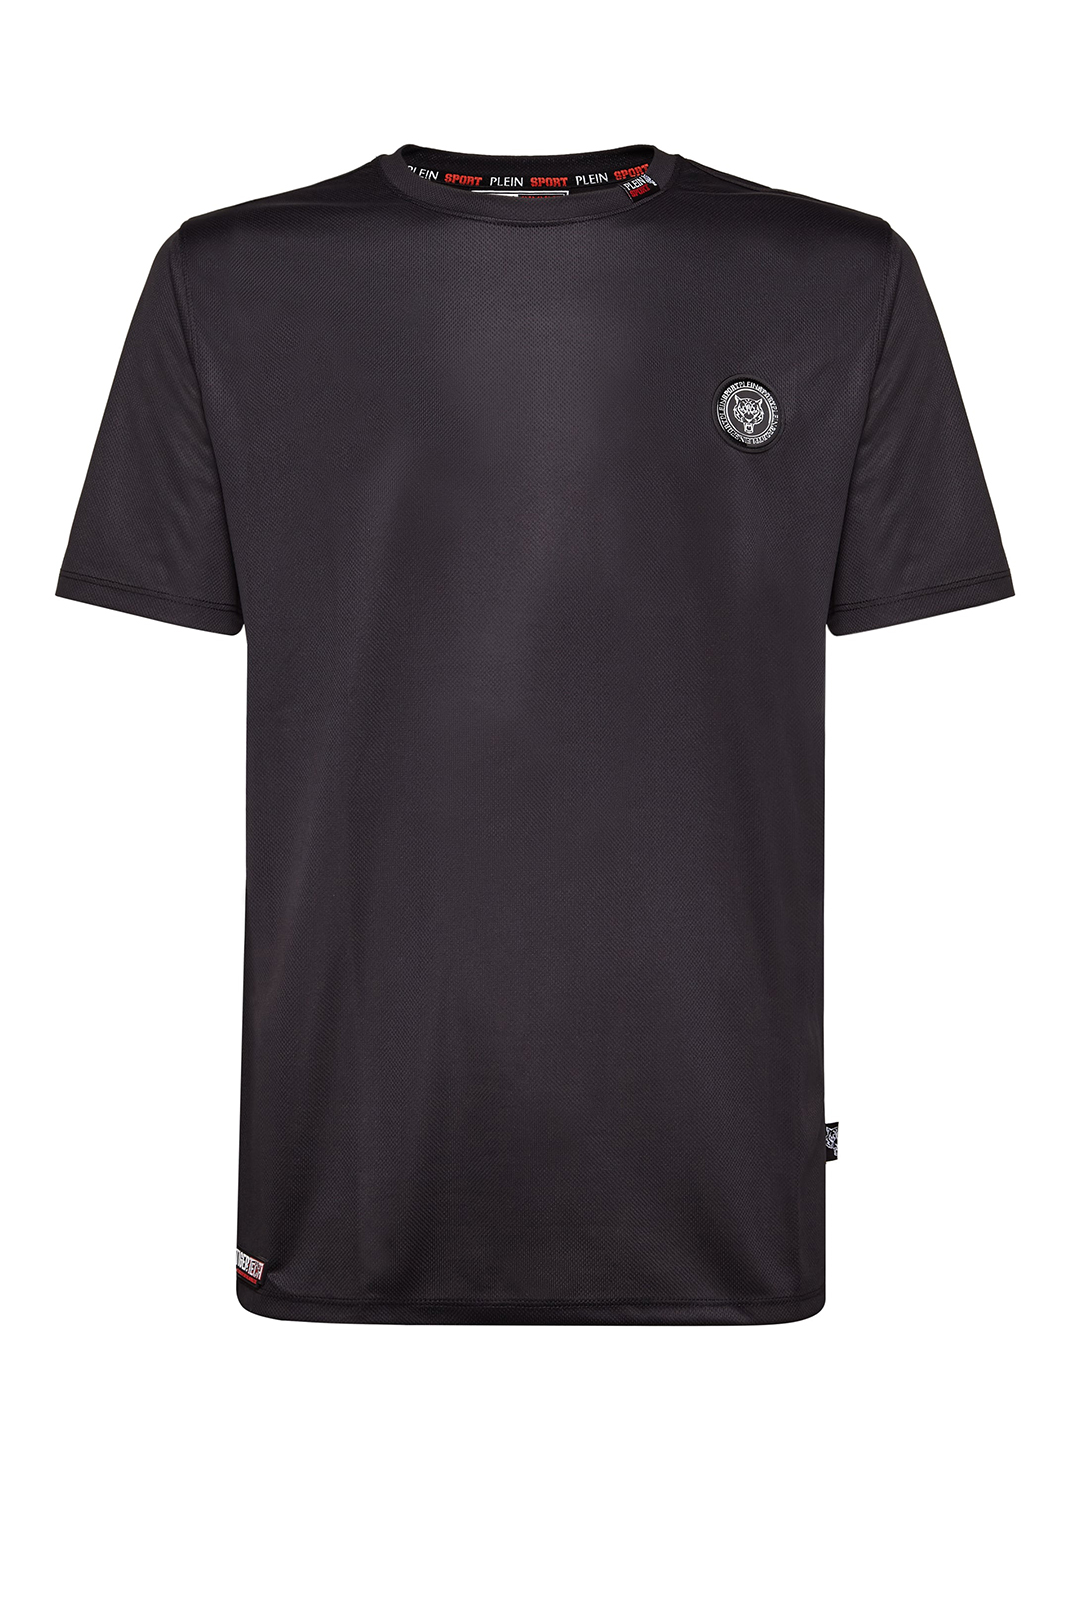 Tee-shirts  Plein Sport MTK2108 LUKA 02 BLACK